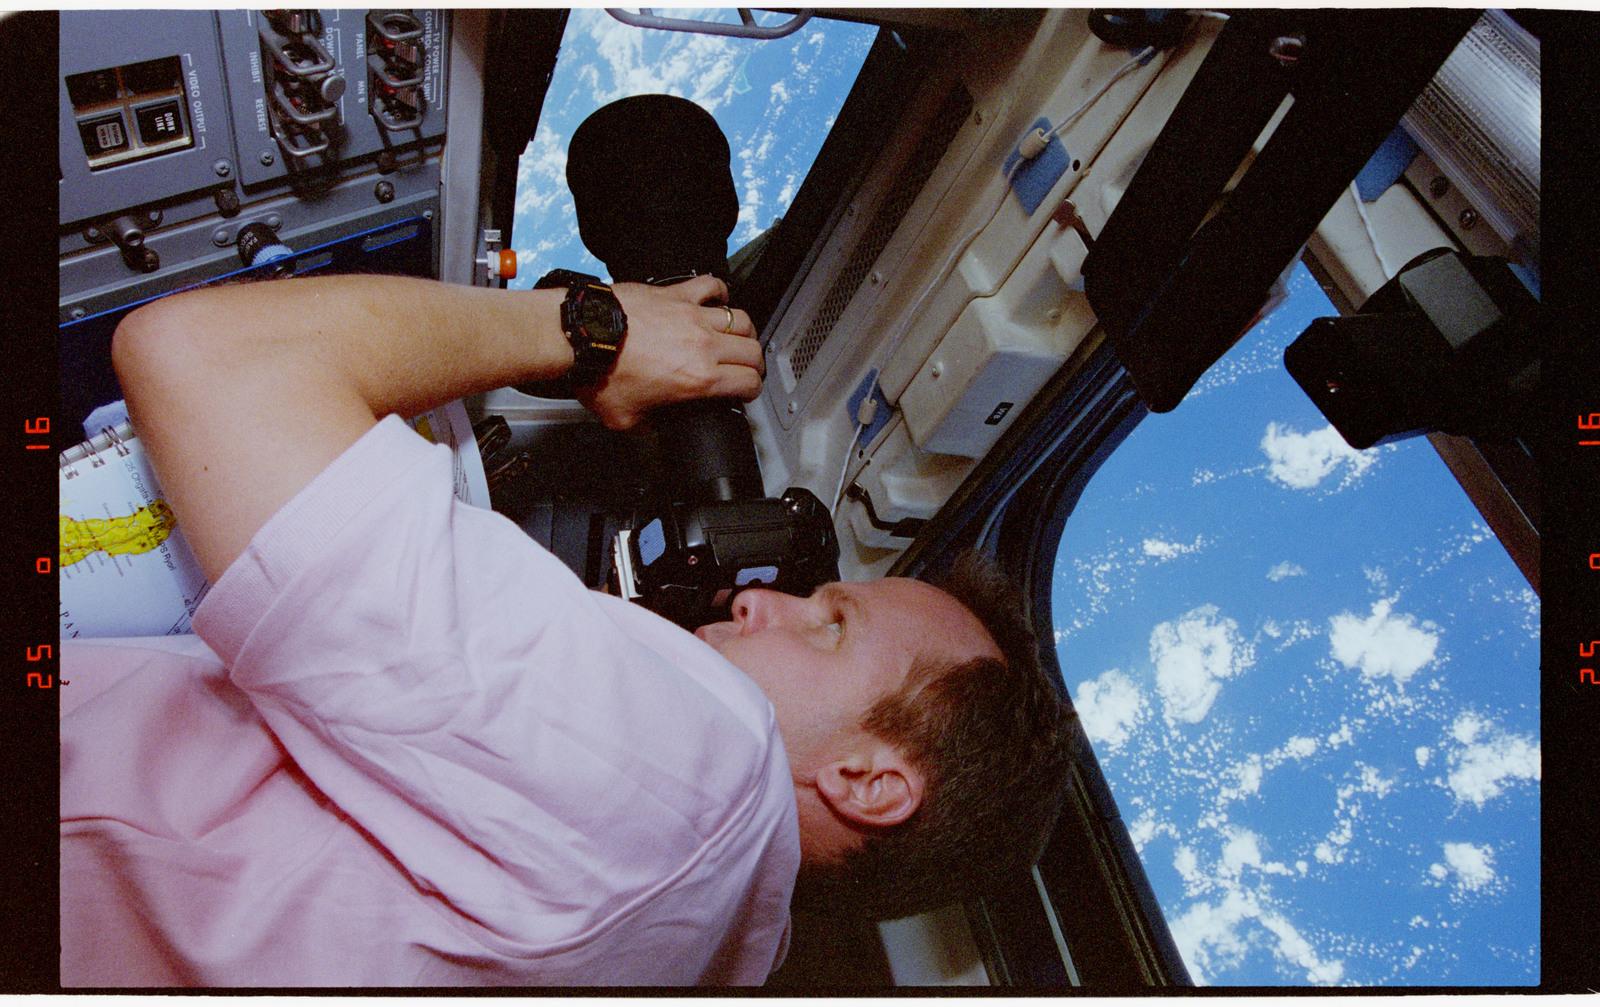 STS068-41-018 - STS-068 - STS-68 crew on orbiter flight deck